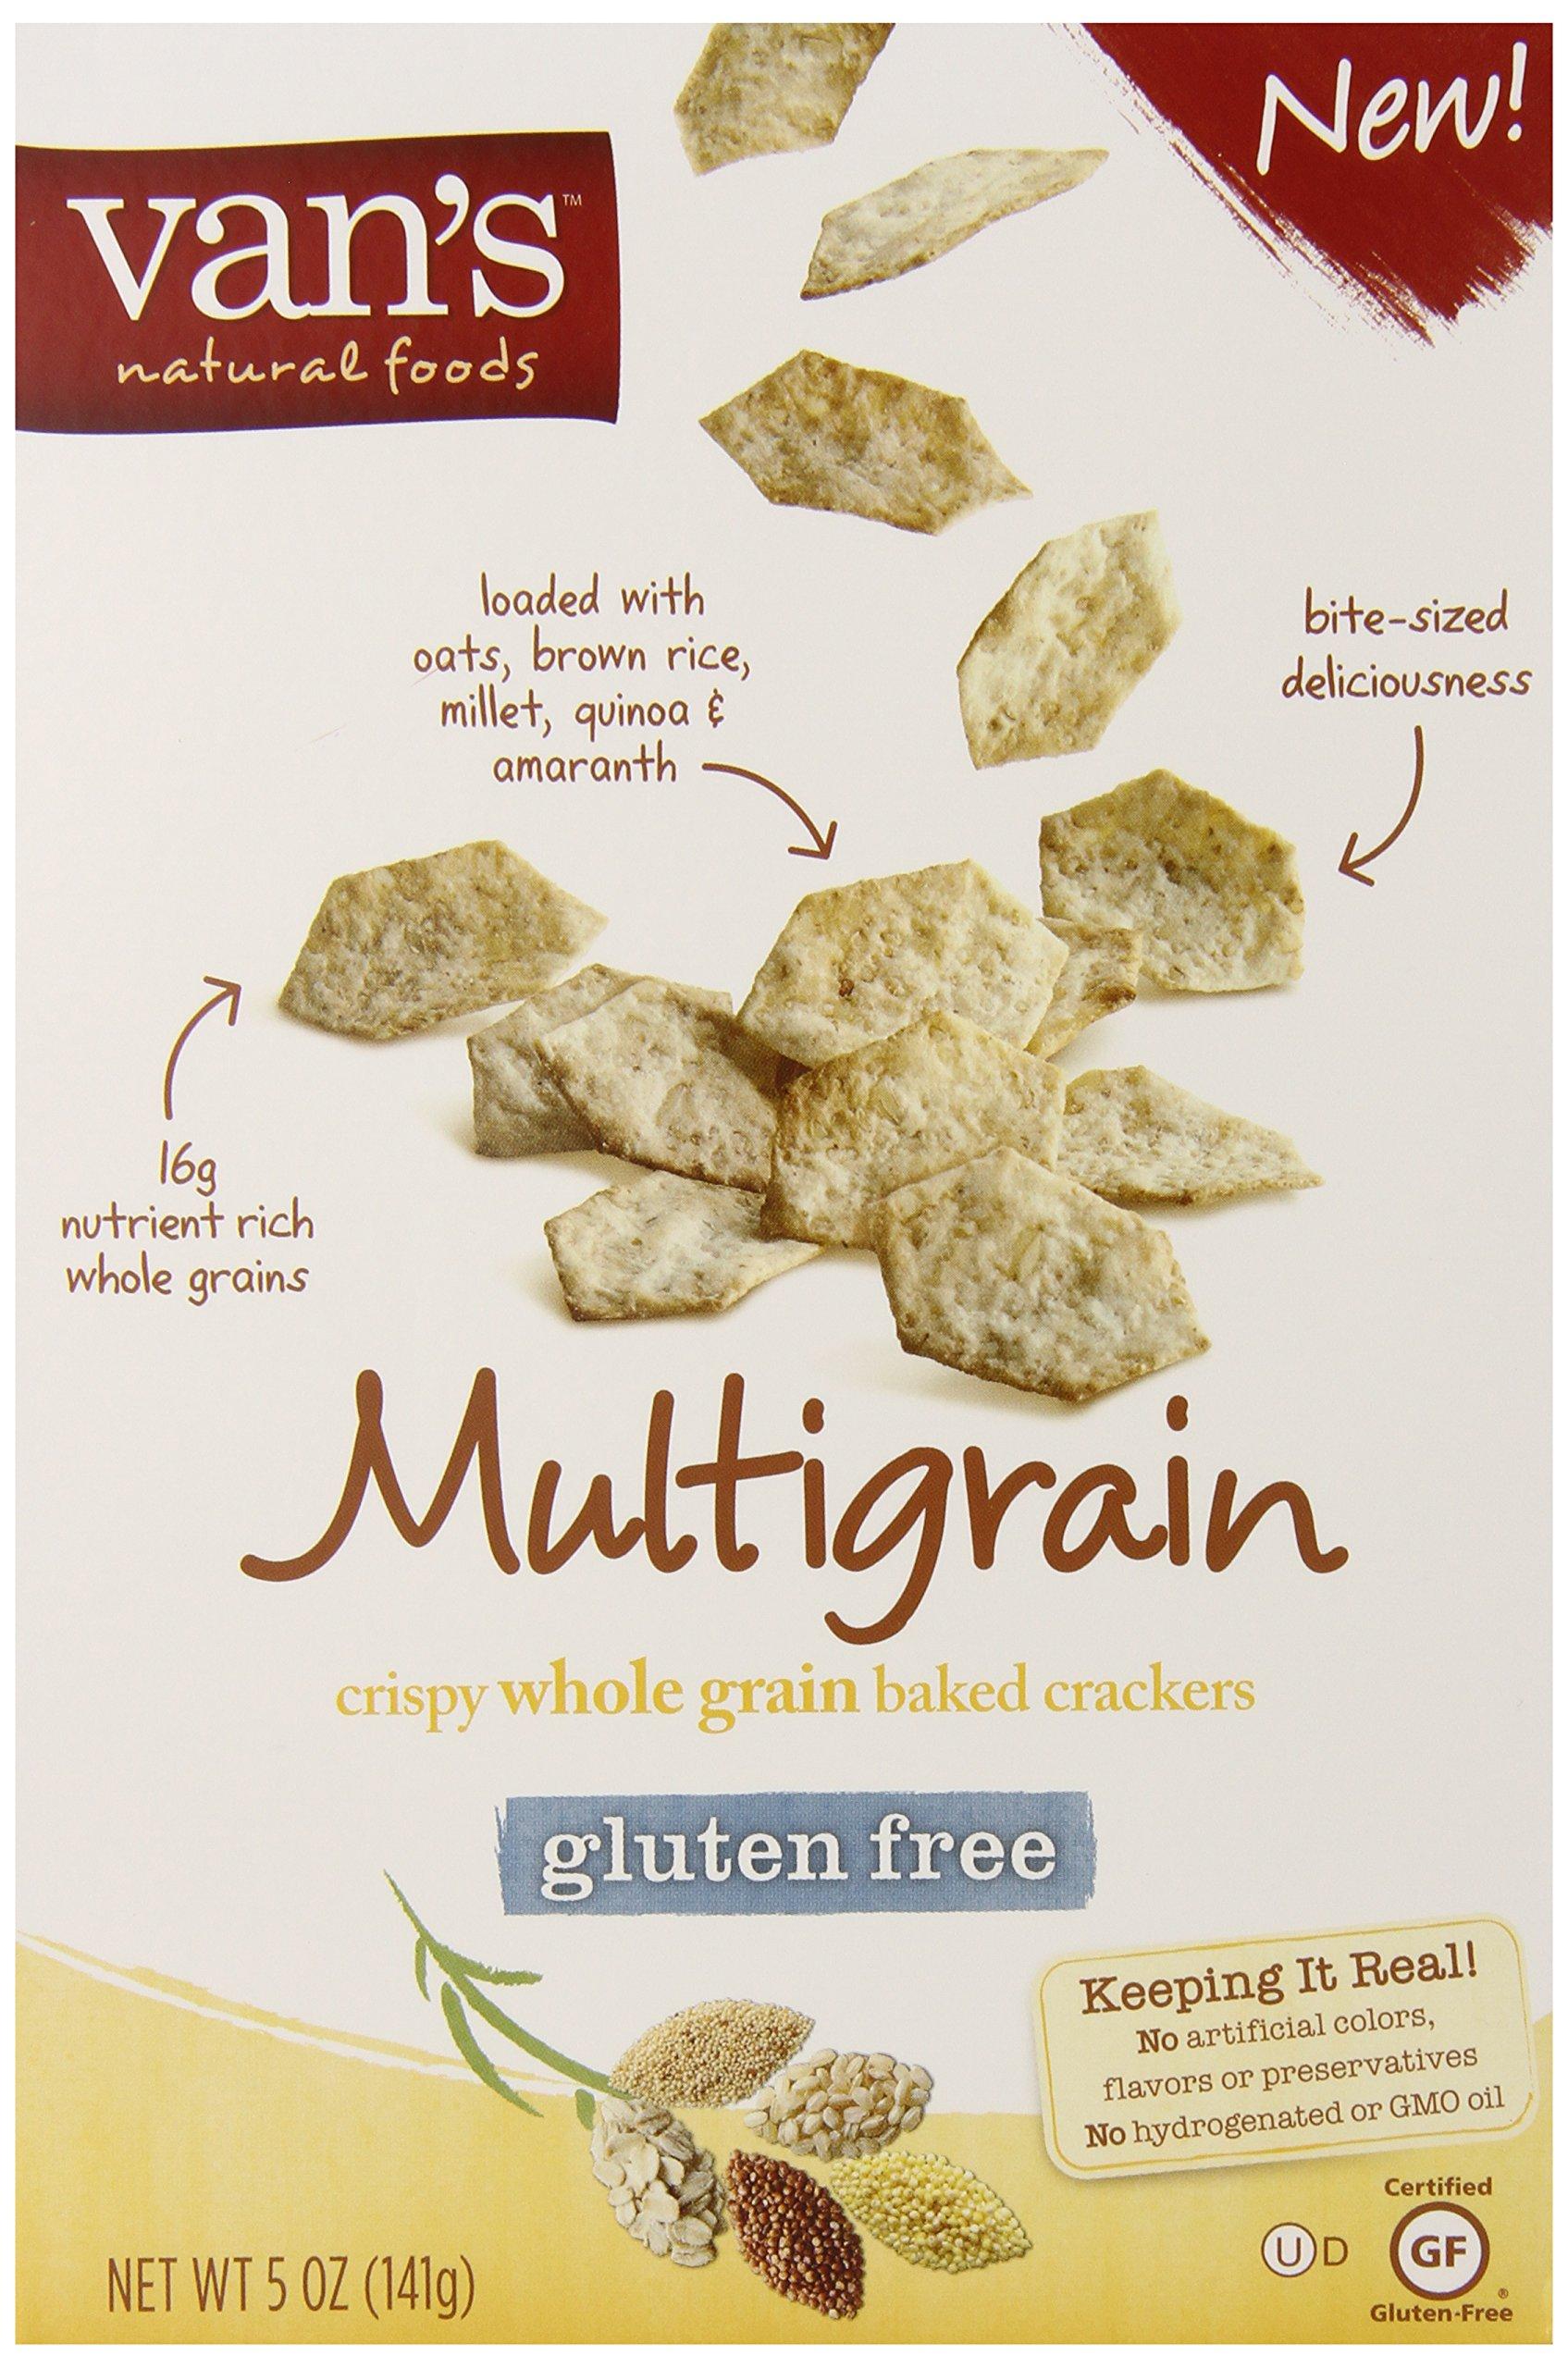 Vans Natural Foods Multigrain Gluten Free Crackers, 5 Ounce - 6 per case. by Van's Natural Foods